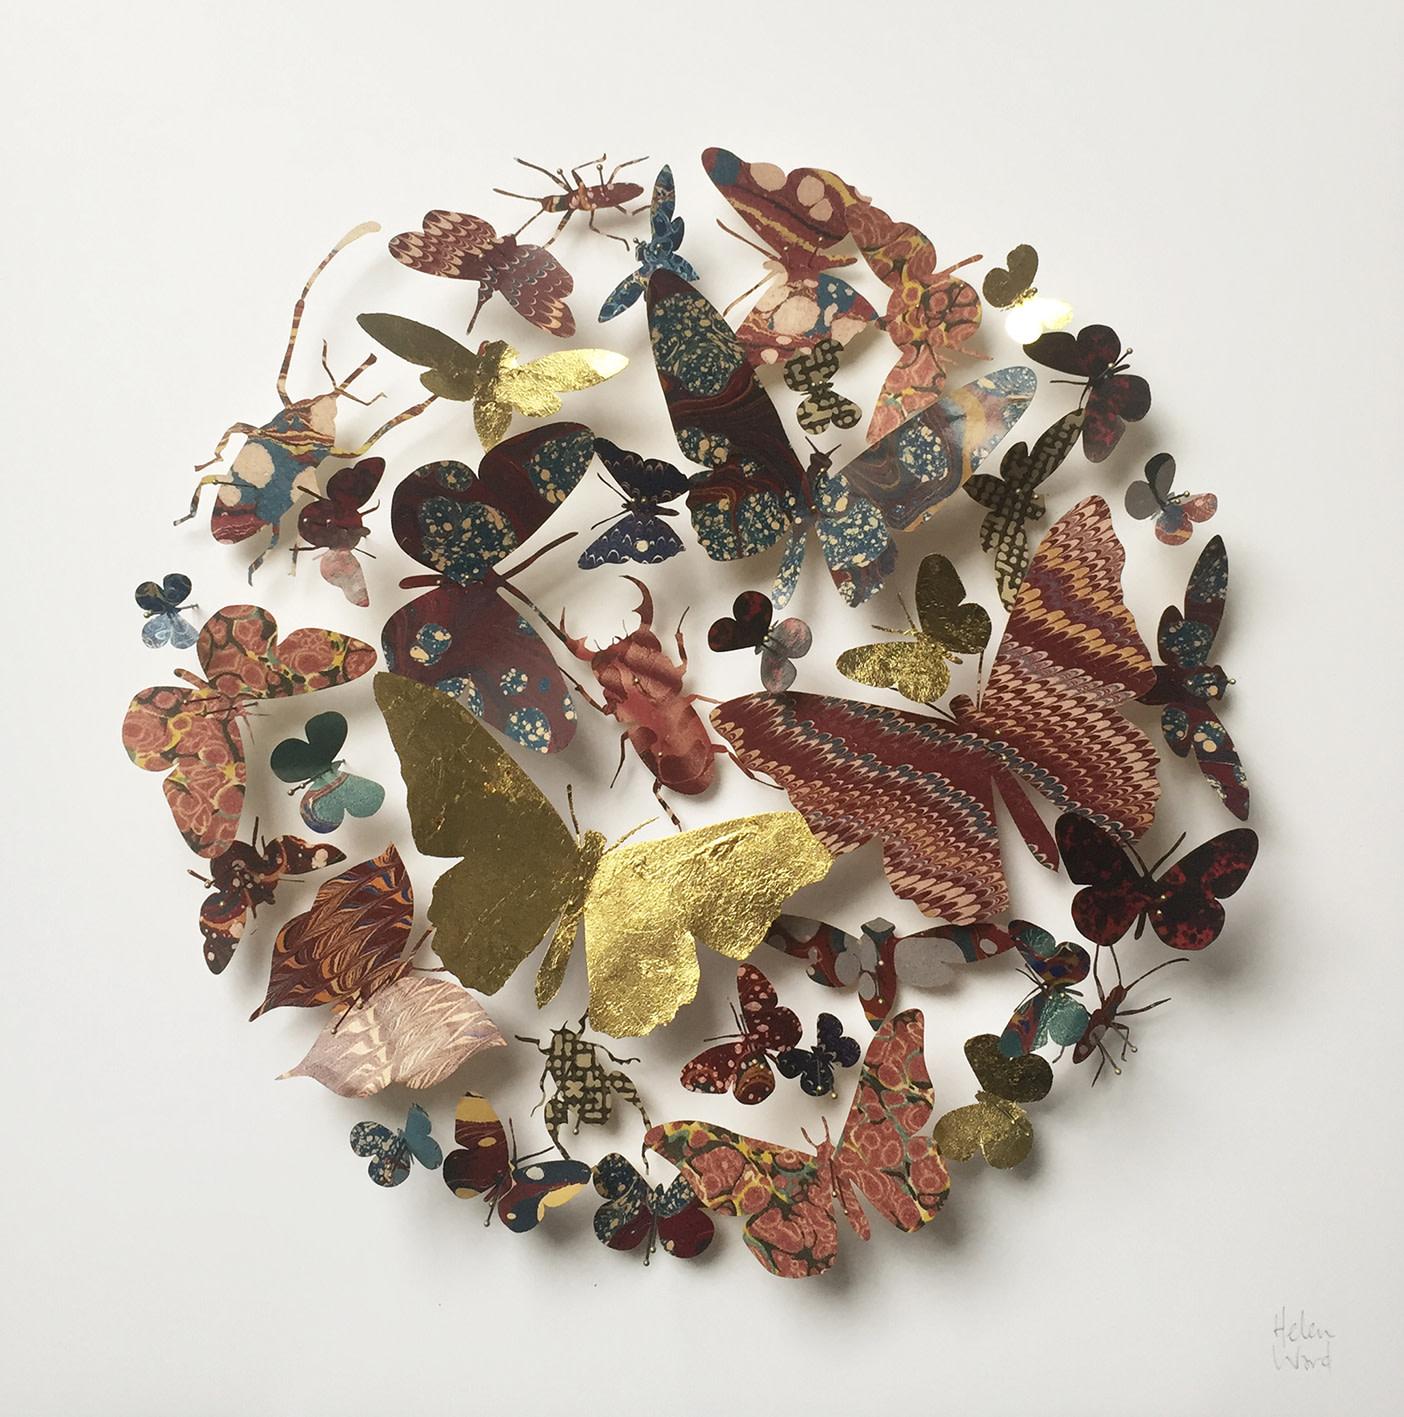 <span class=&#34;link fancybox-details-link&#34;><a href=&#34;/artists/142-helen-ward/works/6238-helen-ward-red-flutter-2019/&#34;>View Detail Page</a></span><div class=&#34;artist&#34;><strong>Helen Ward</strong></div> <div class=&#34;title&#34;><em>Red Flutter</em>, 2019</div> <div class=&#34;medium&#34;>Victorian entomology drawer, hand-marbled papers, Victorian hand written letter, gold leaf, enamel pins</div> <div class=&#34;dimensions&#34;>30 x 30 cm</div><div class=&#34;price&#34;>£480.00</div><div class=&#34;copyright_line&#34;>Own Art: £ 48 x 10 Monthly 0% APR Representative Payments</div>